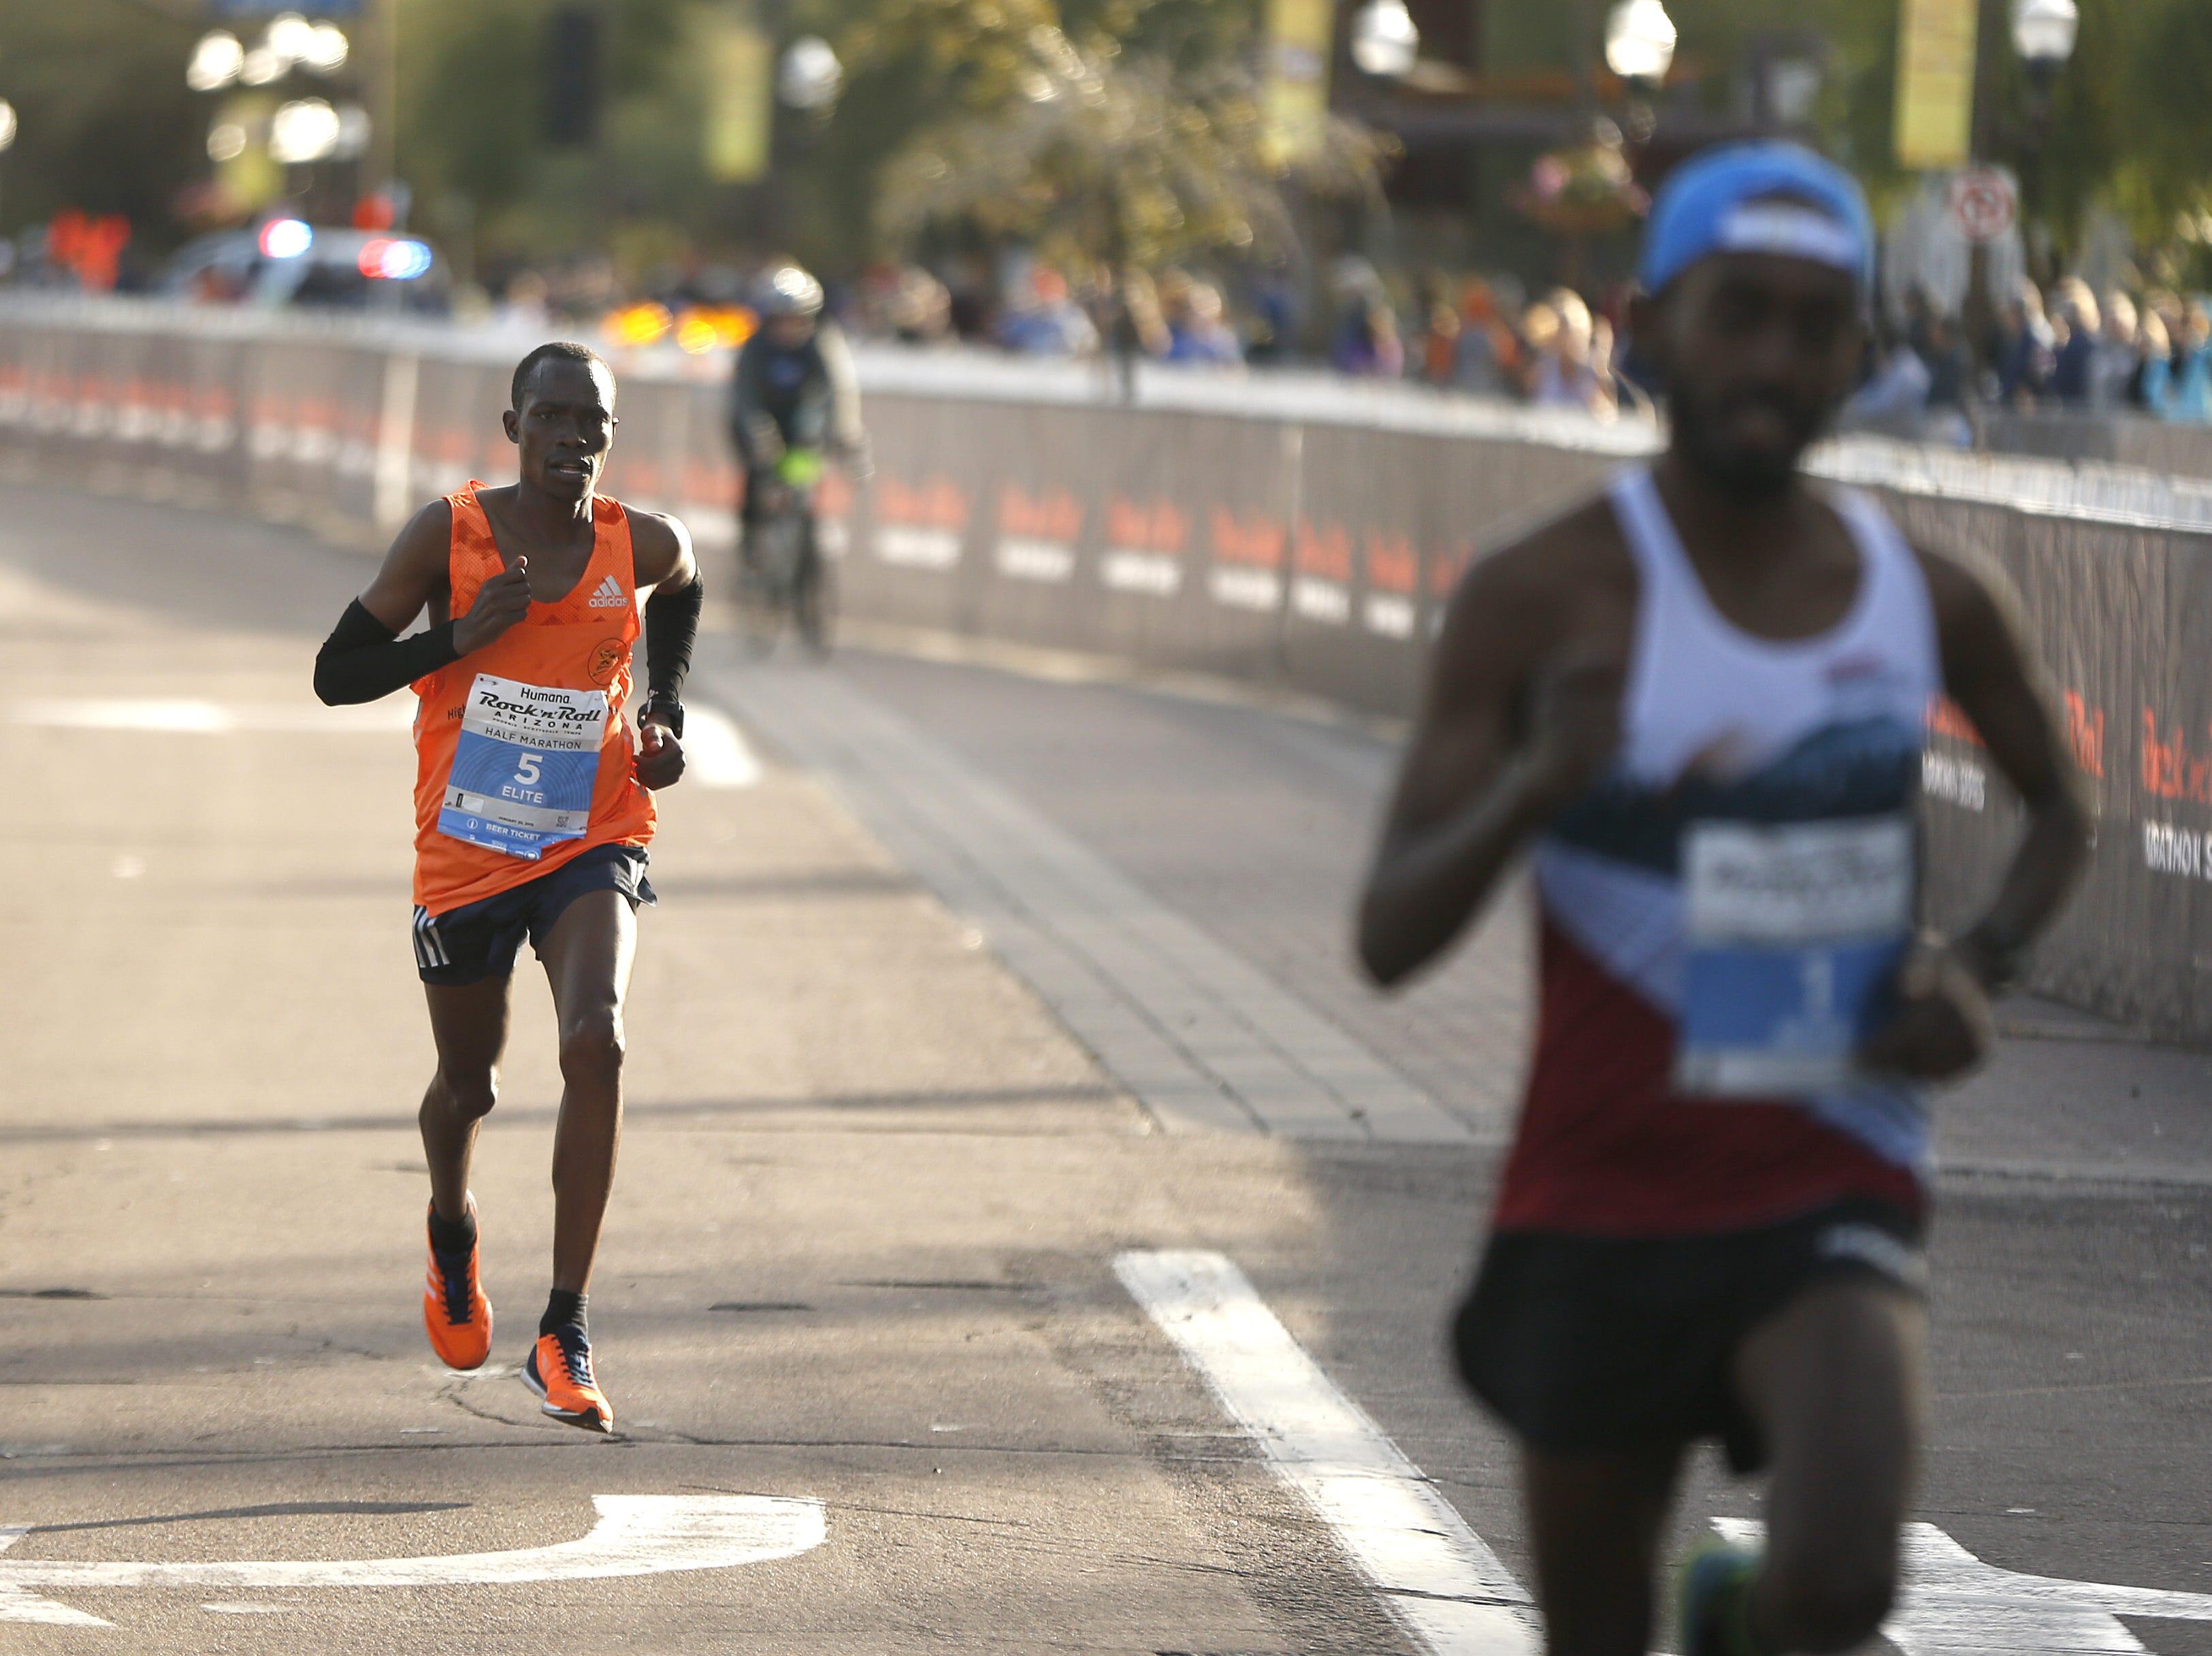 Saidi Makula comes in third during the Rock 'N' Roll half-marathon in Tempe on Jan. 20, 2019.